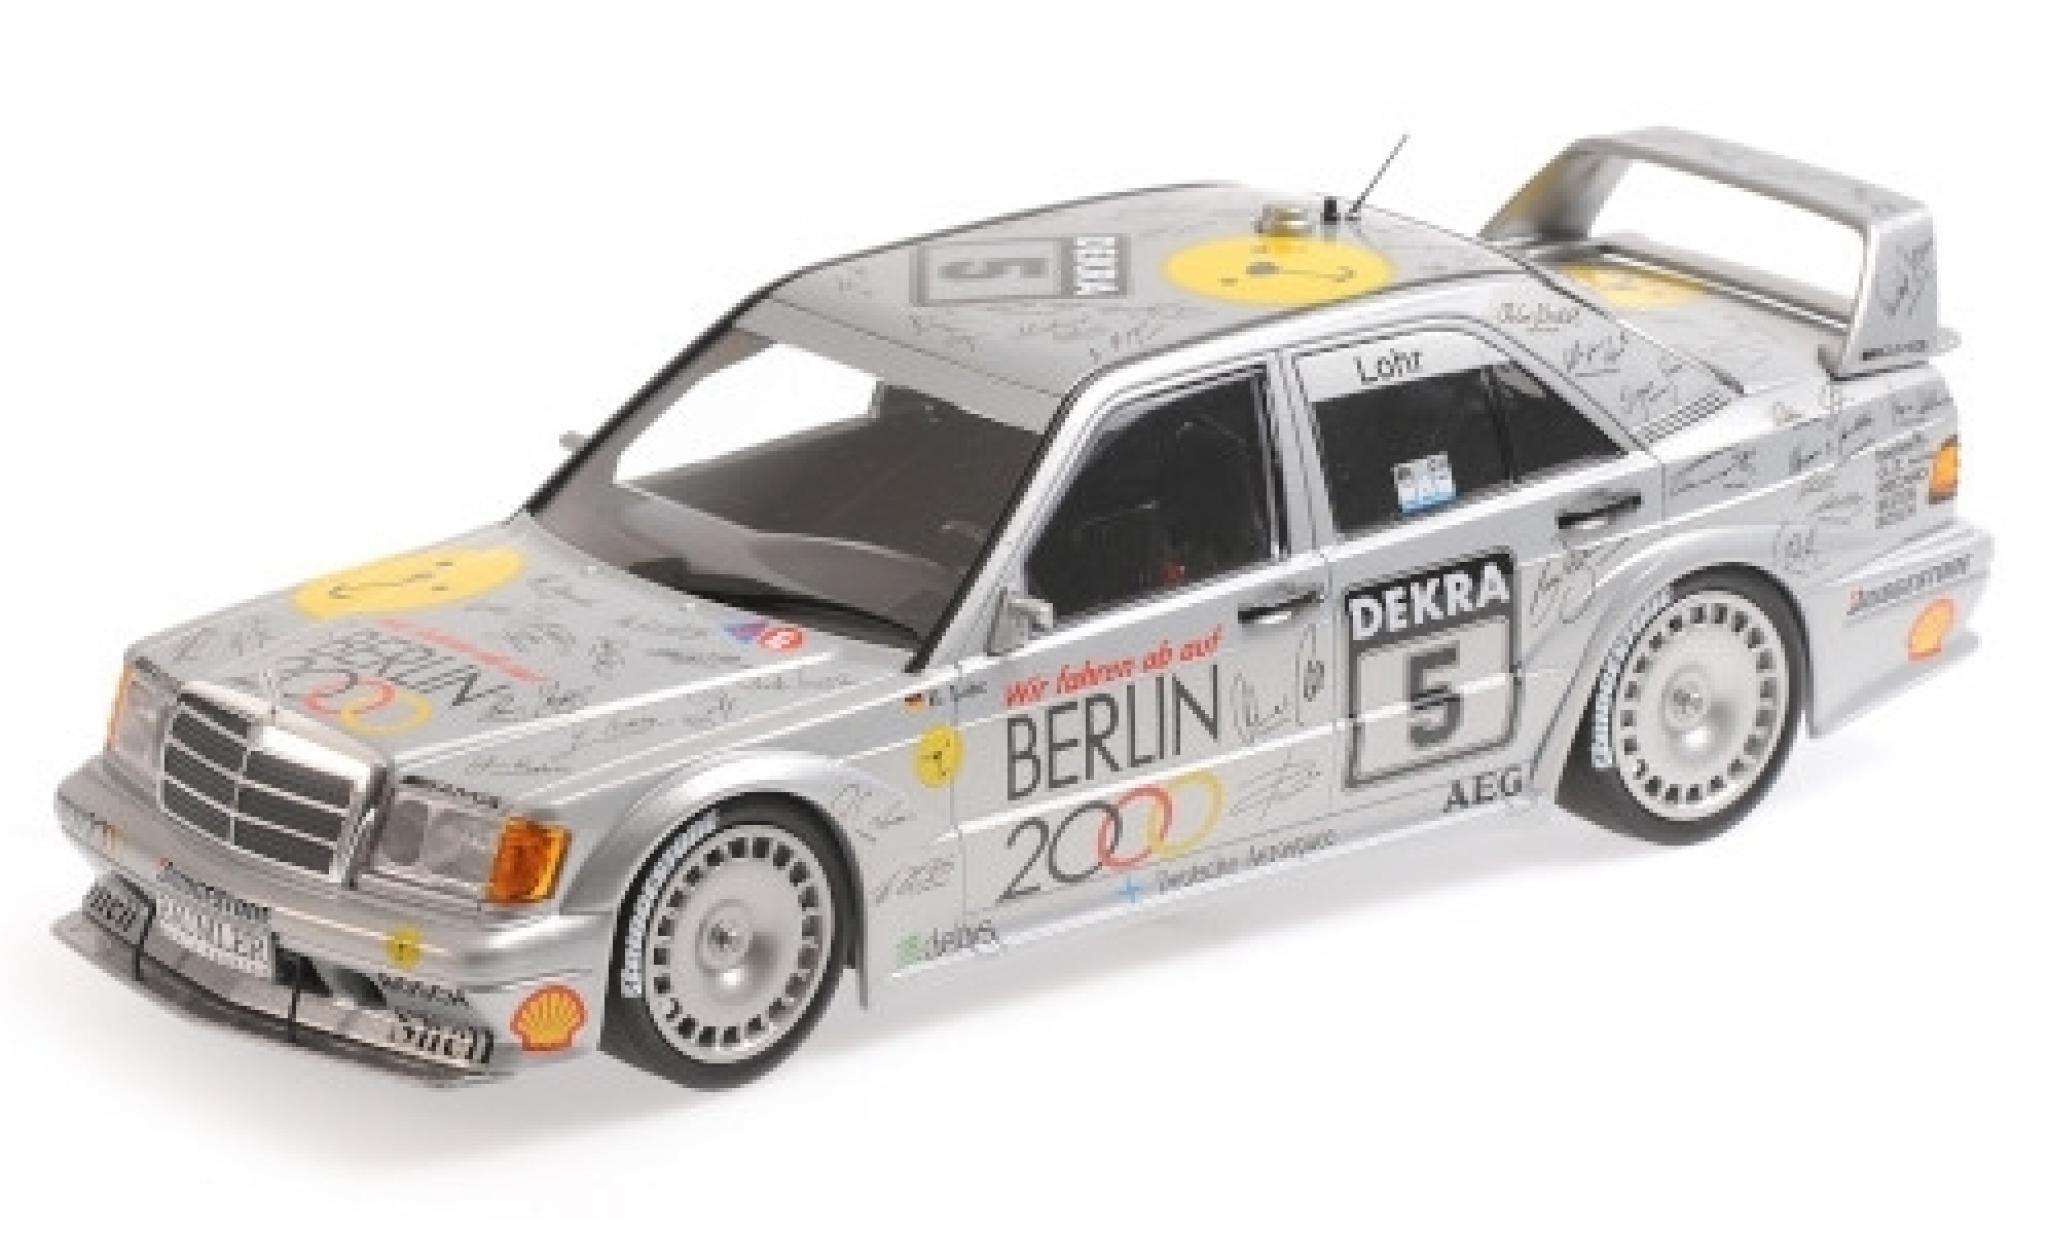 Mercedes 190 1/18 Minichamps E 2.5-16 EVO 2 No.5 Team AMG- Berlin 2000 DTM 1992 E.Lohr